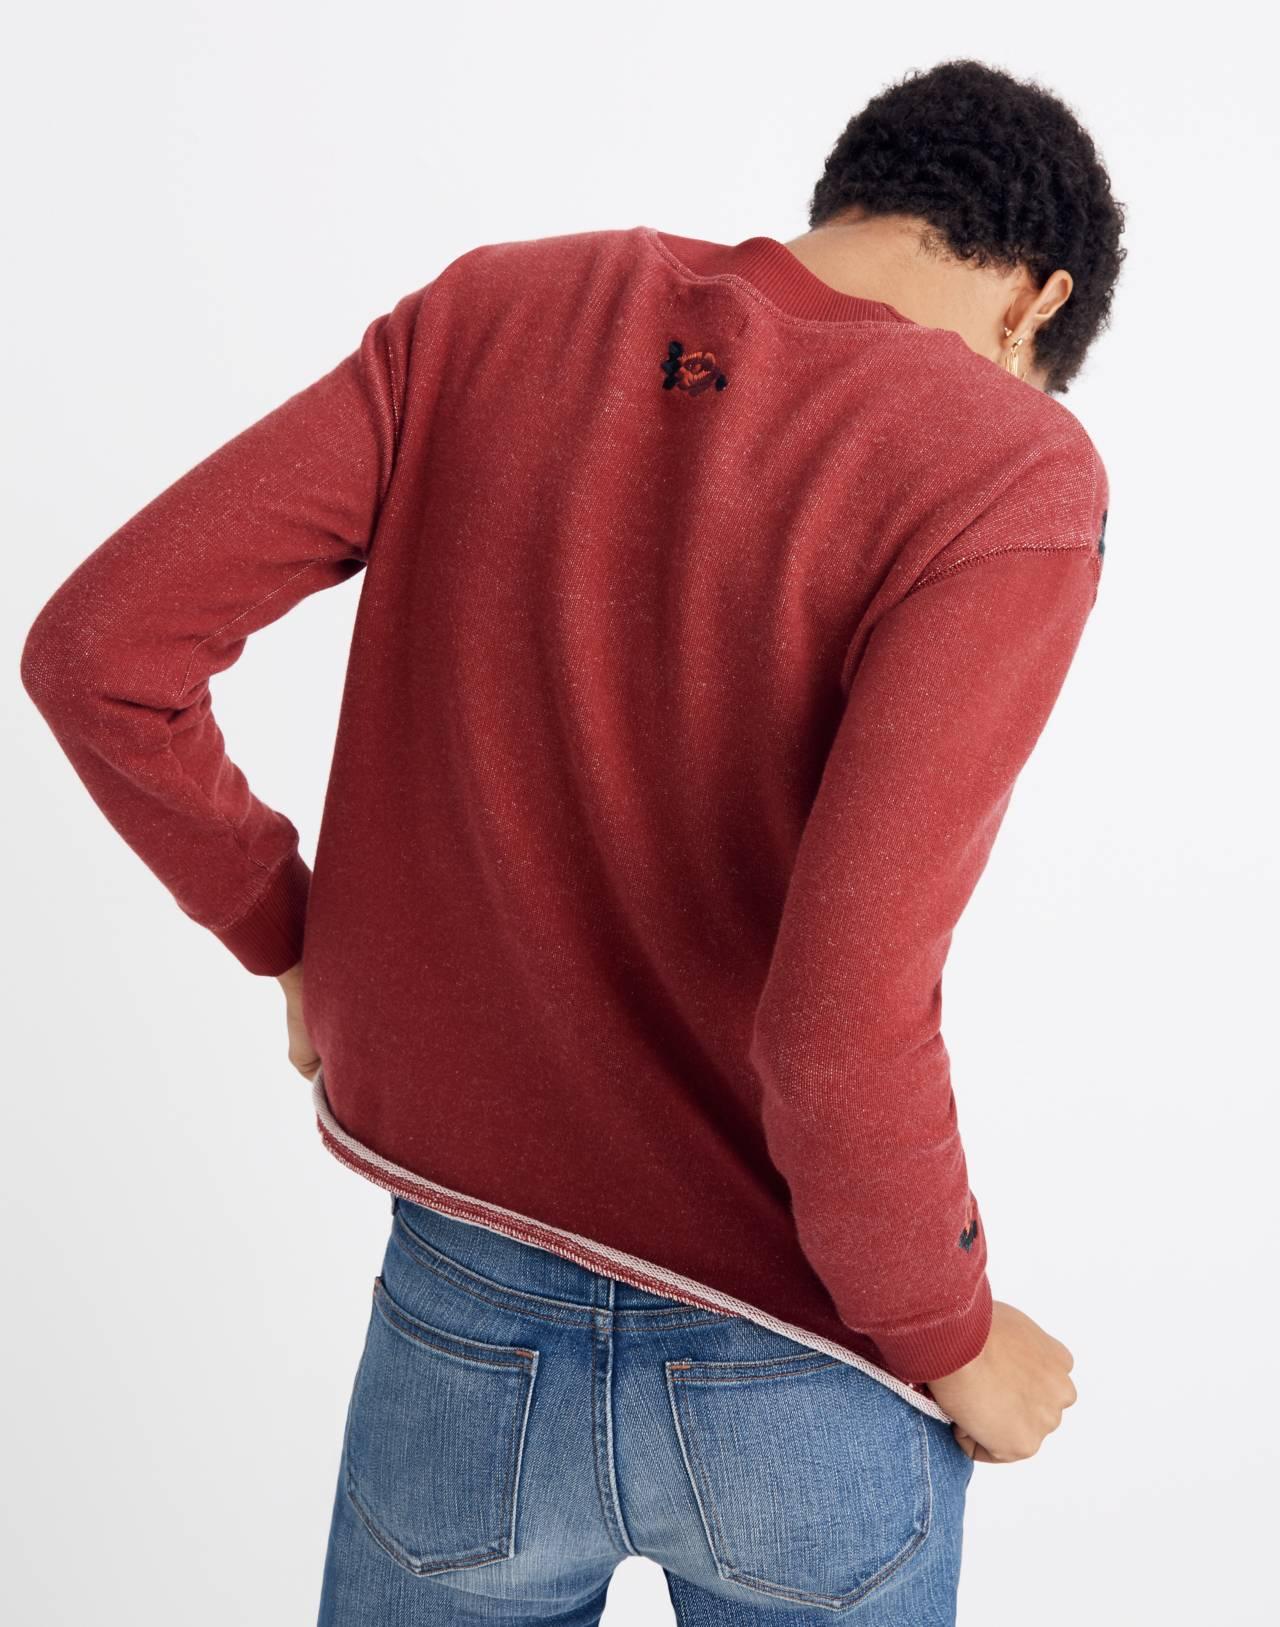 Embroidered Cutoff Sweatshirt in deep crimson image 2